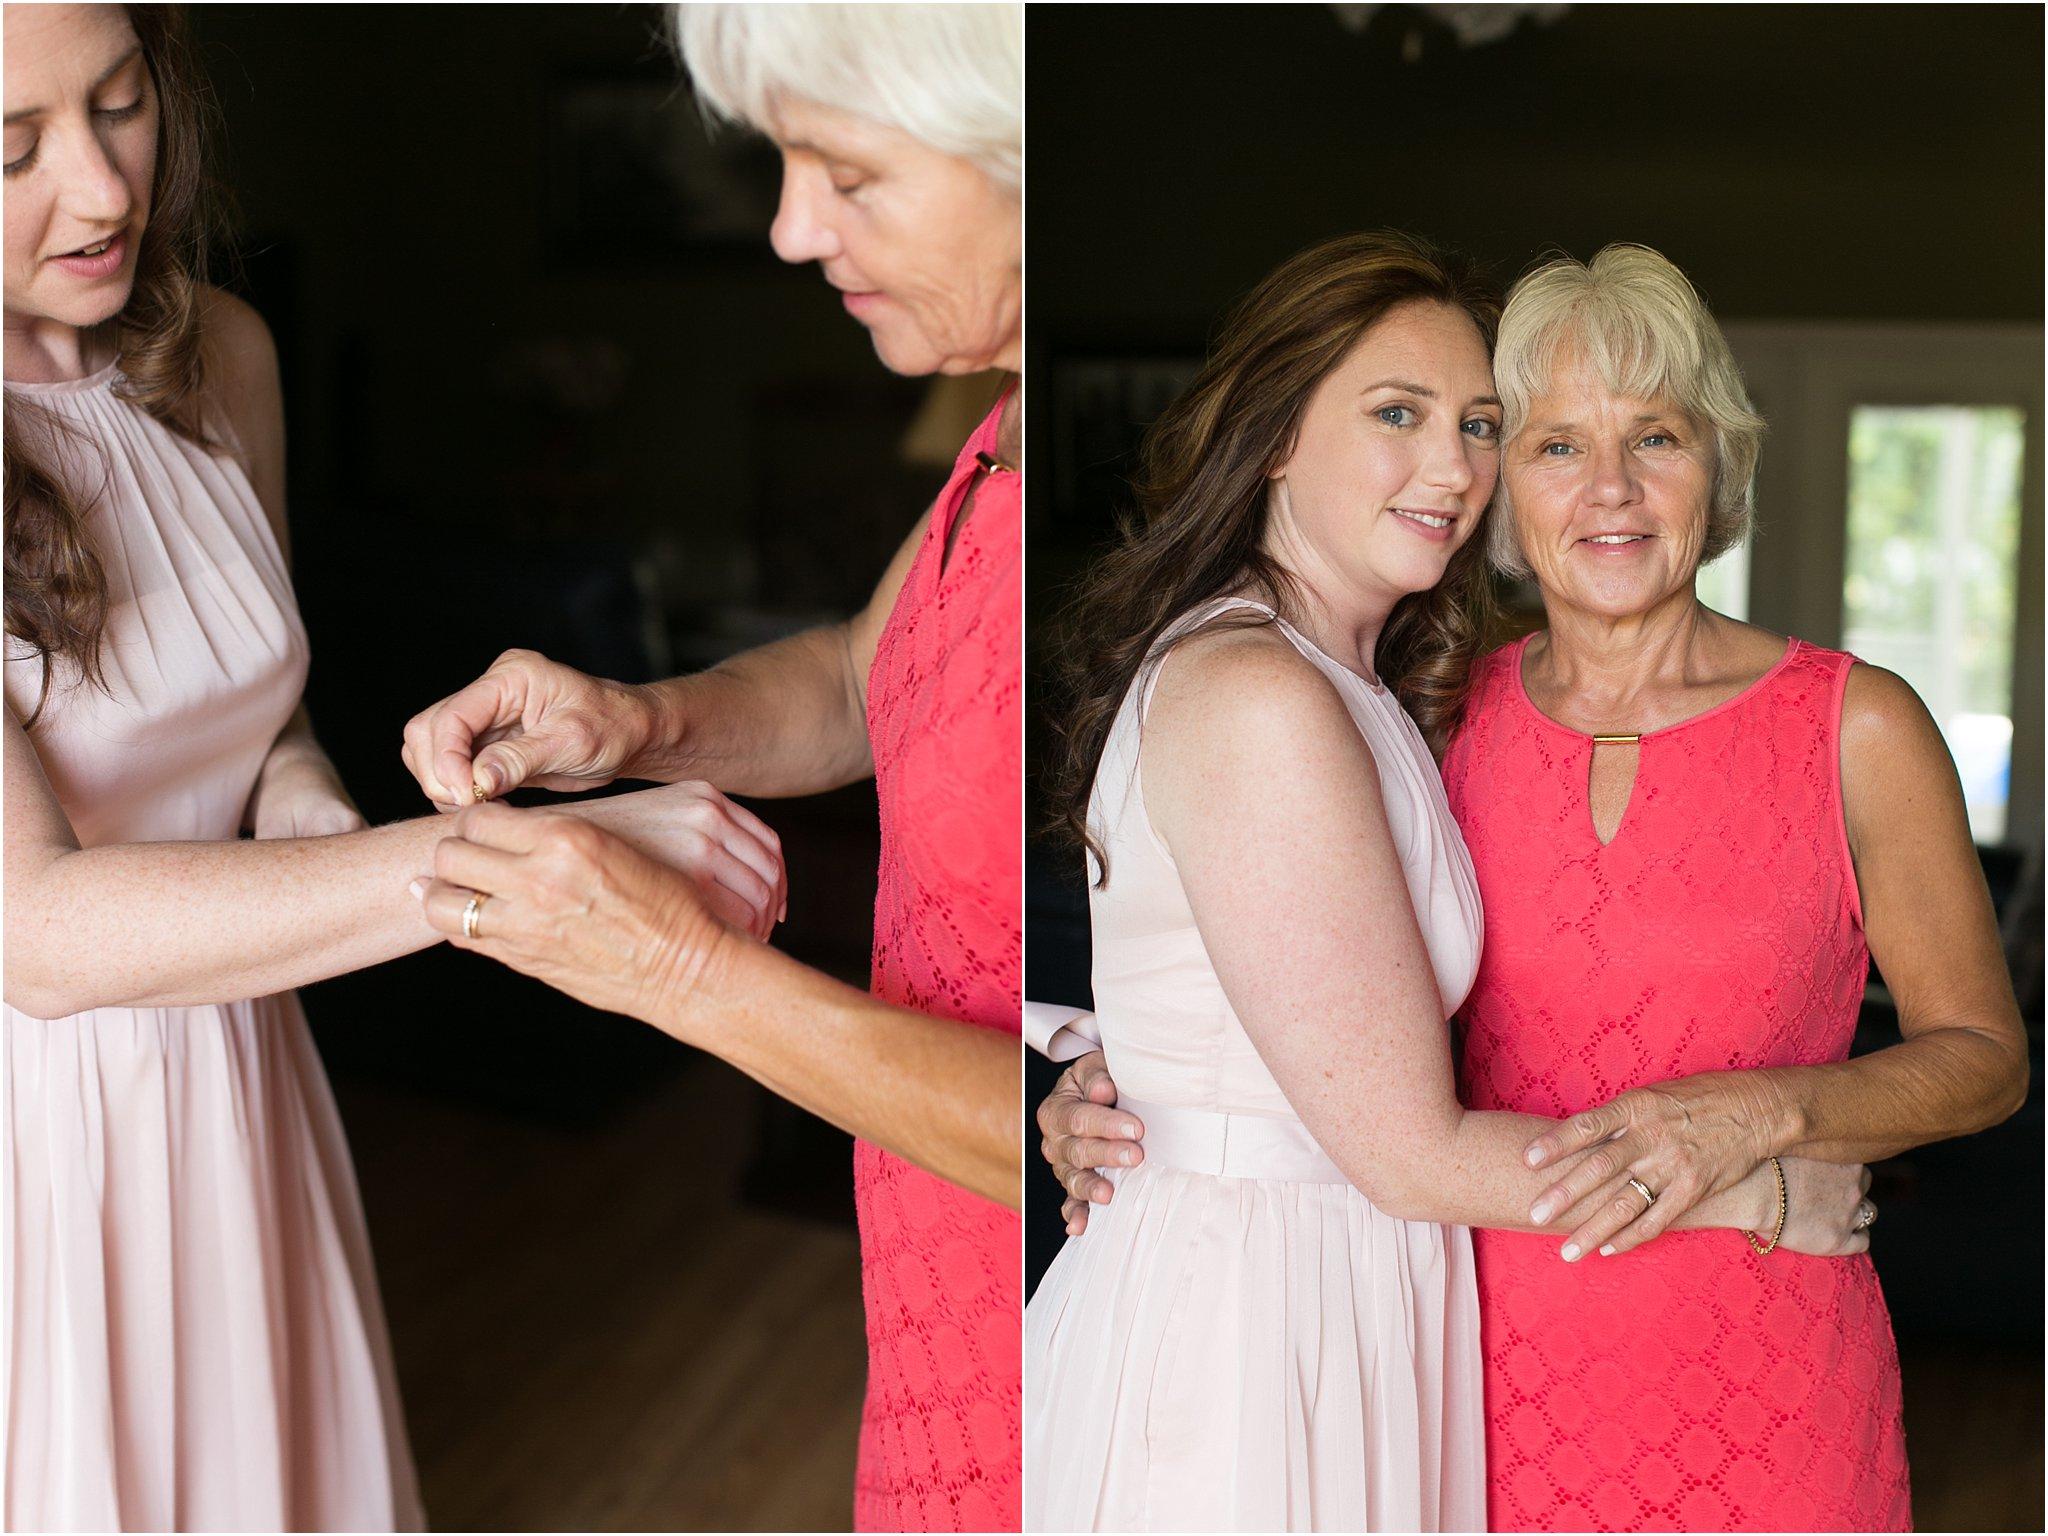 jessica_ryan_photography_wedding_photographs_virginia_fernandina_beach_florida_wedding_2093